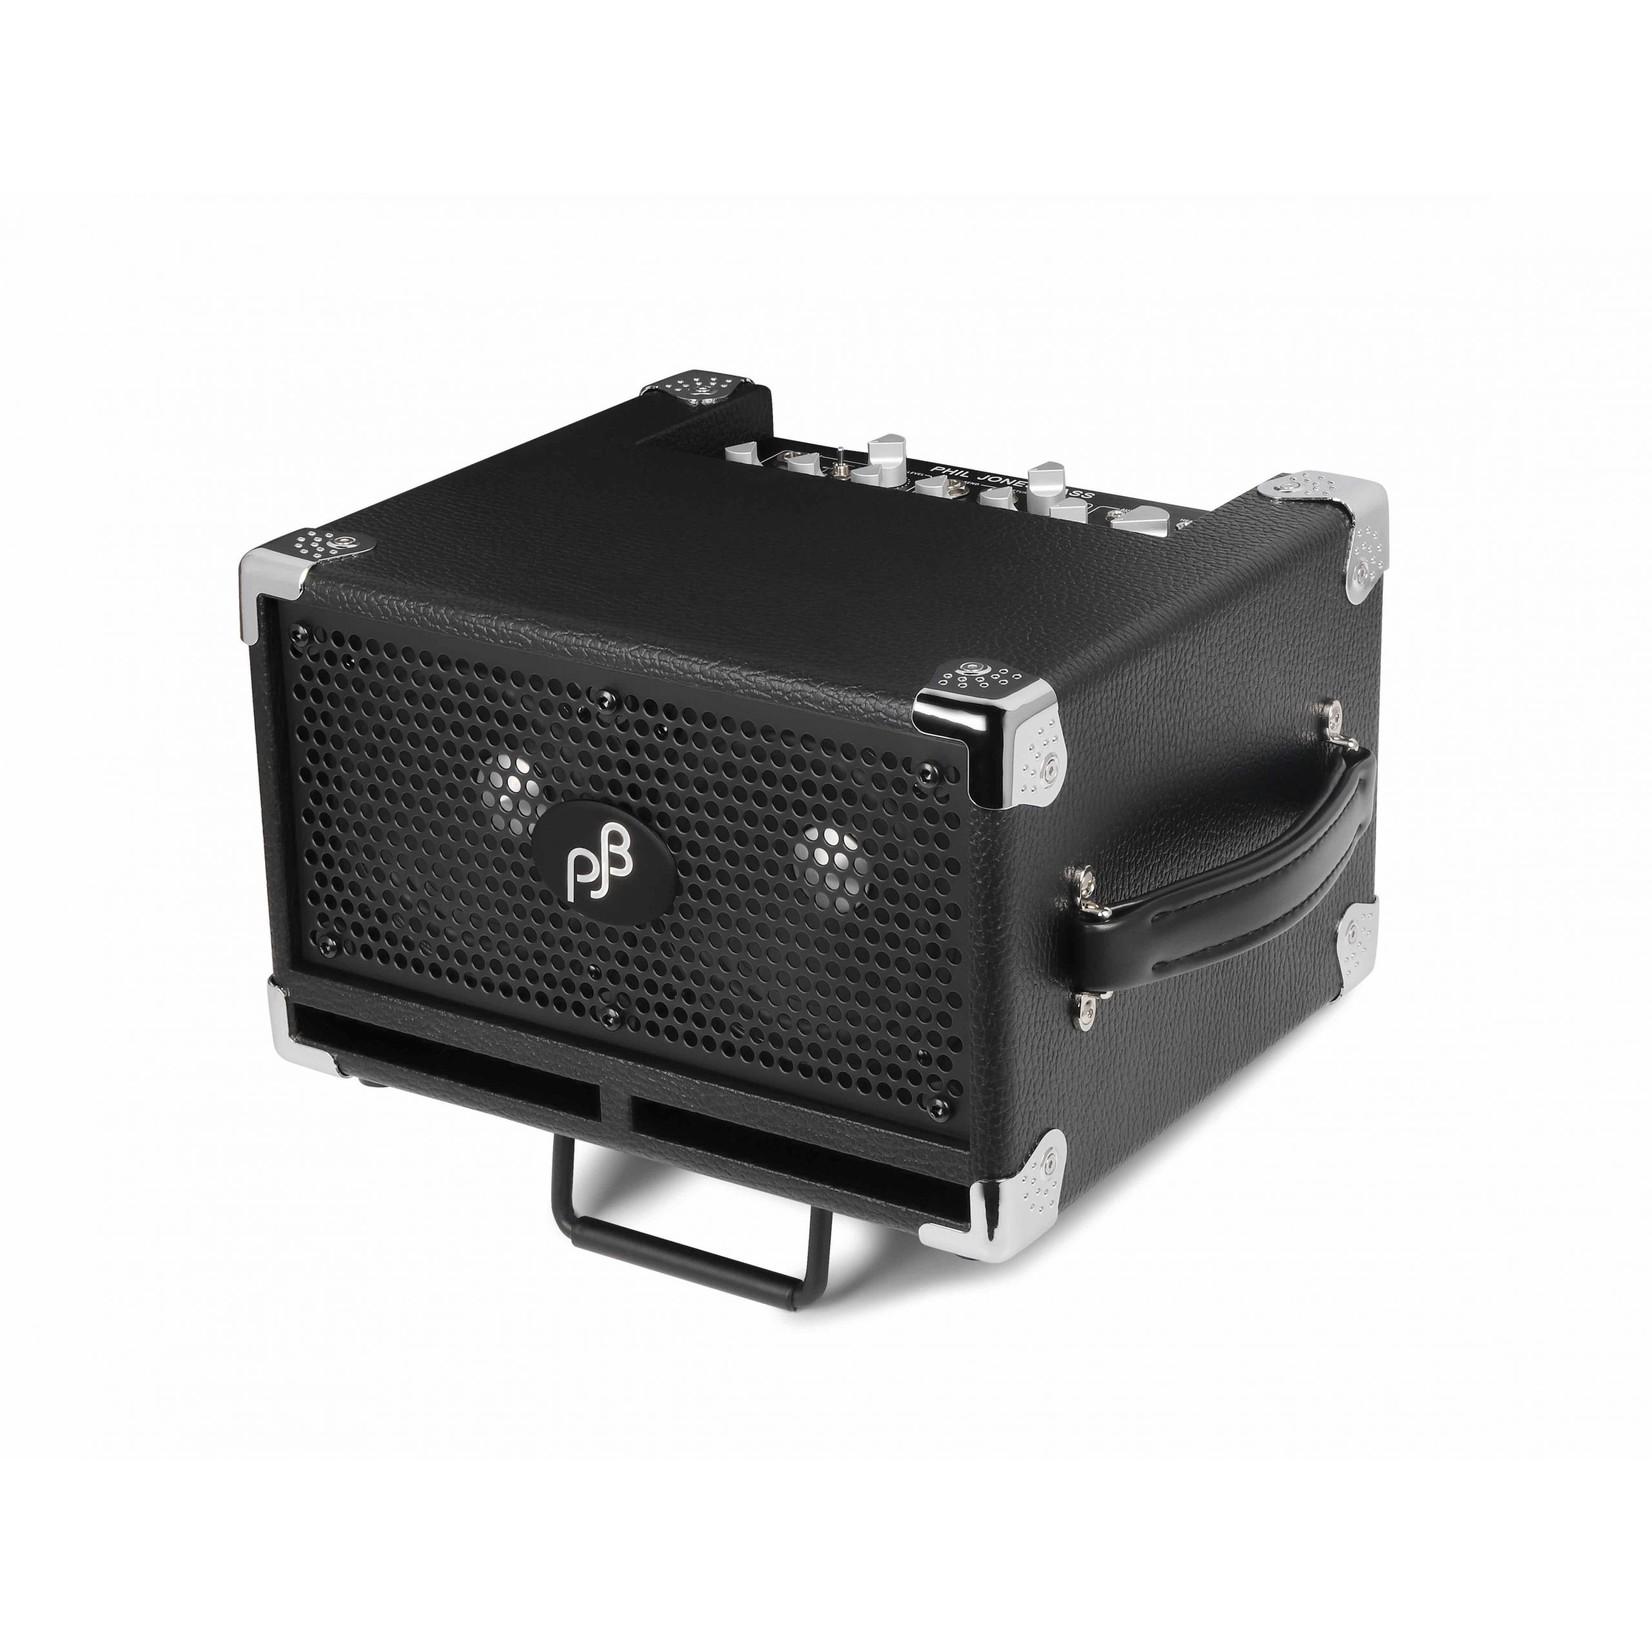 "Phil Jones Phil Jones Bass Cub Pro 120W Micro Combo Amp 2x5"" (BG-120B), Black Cabinet"